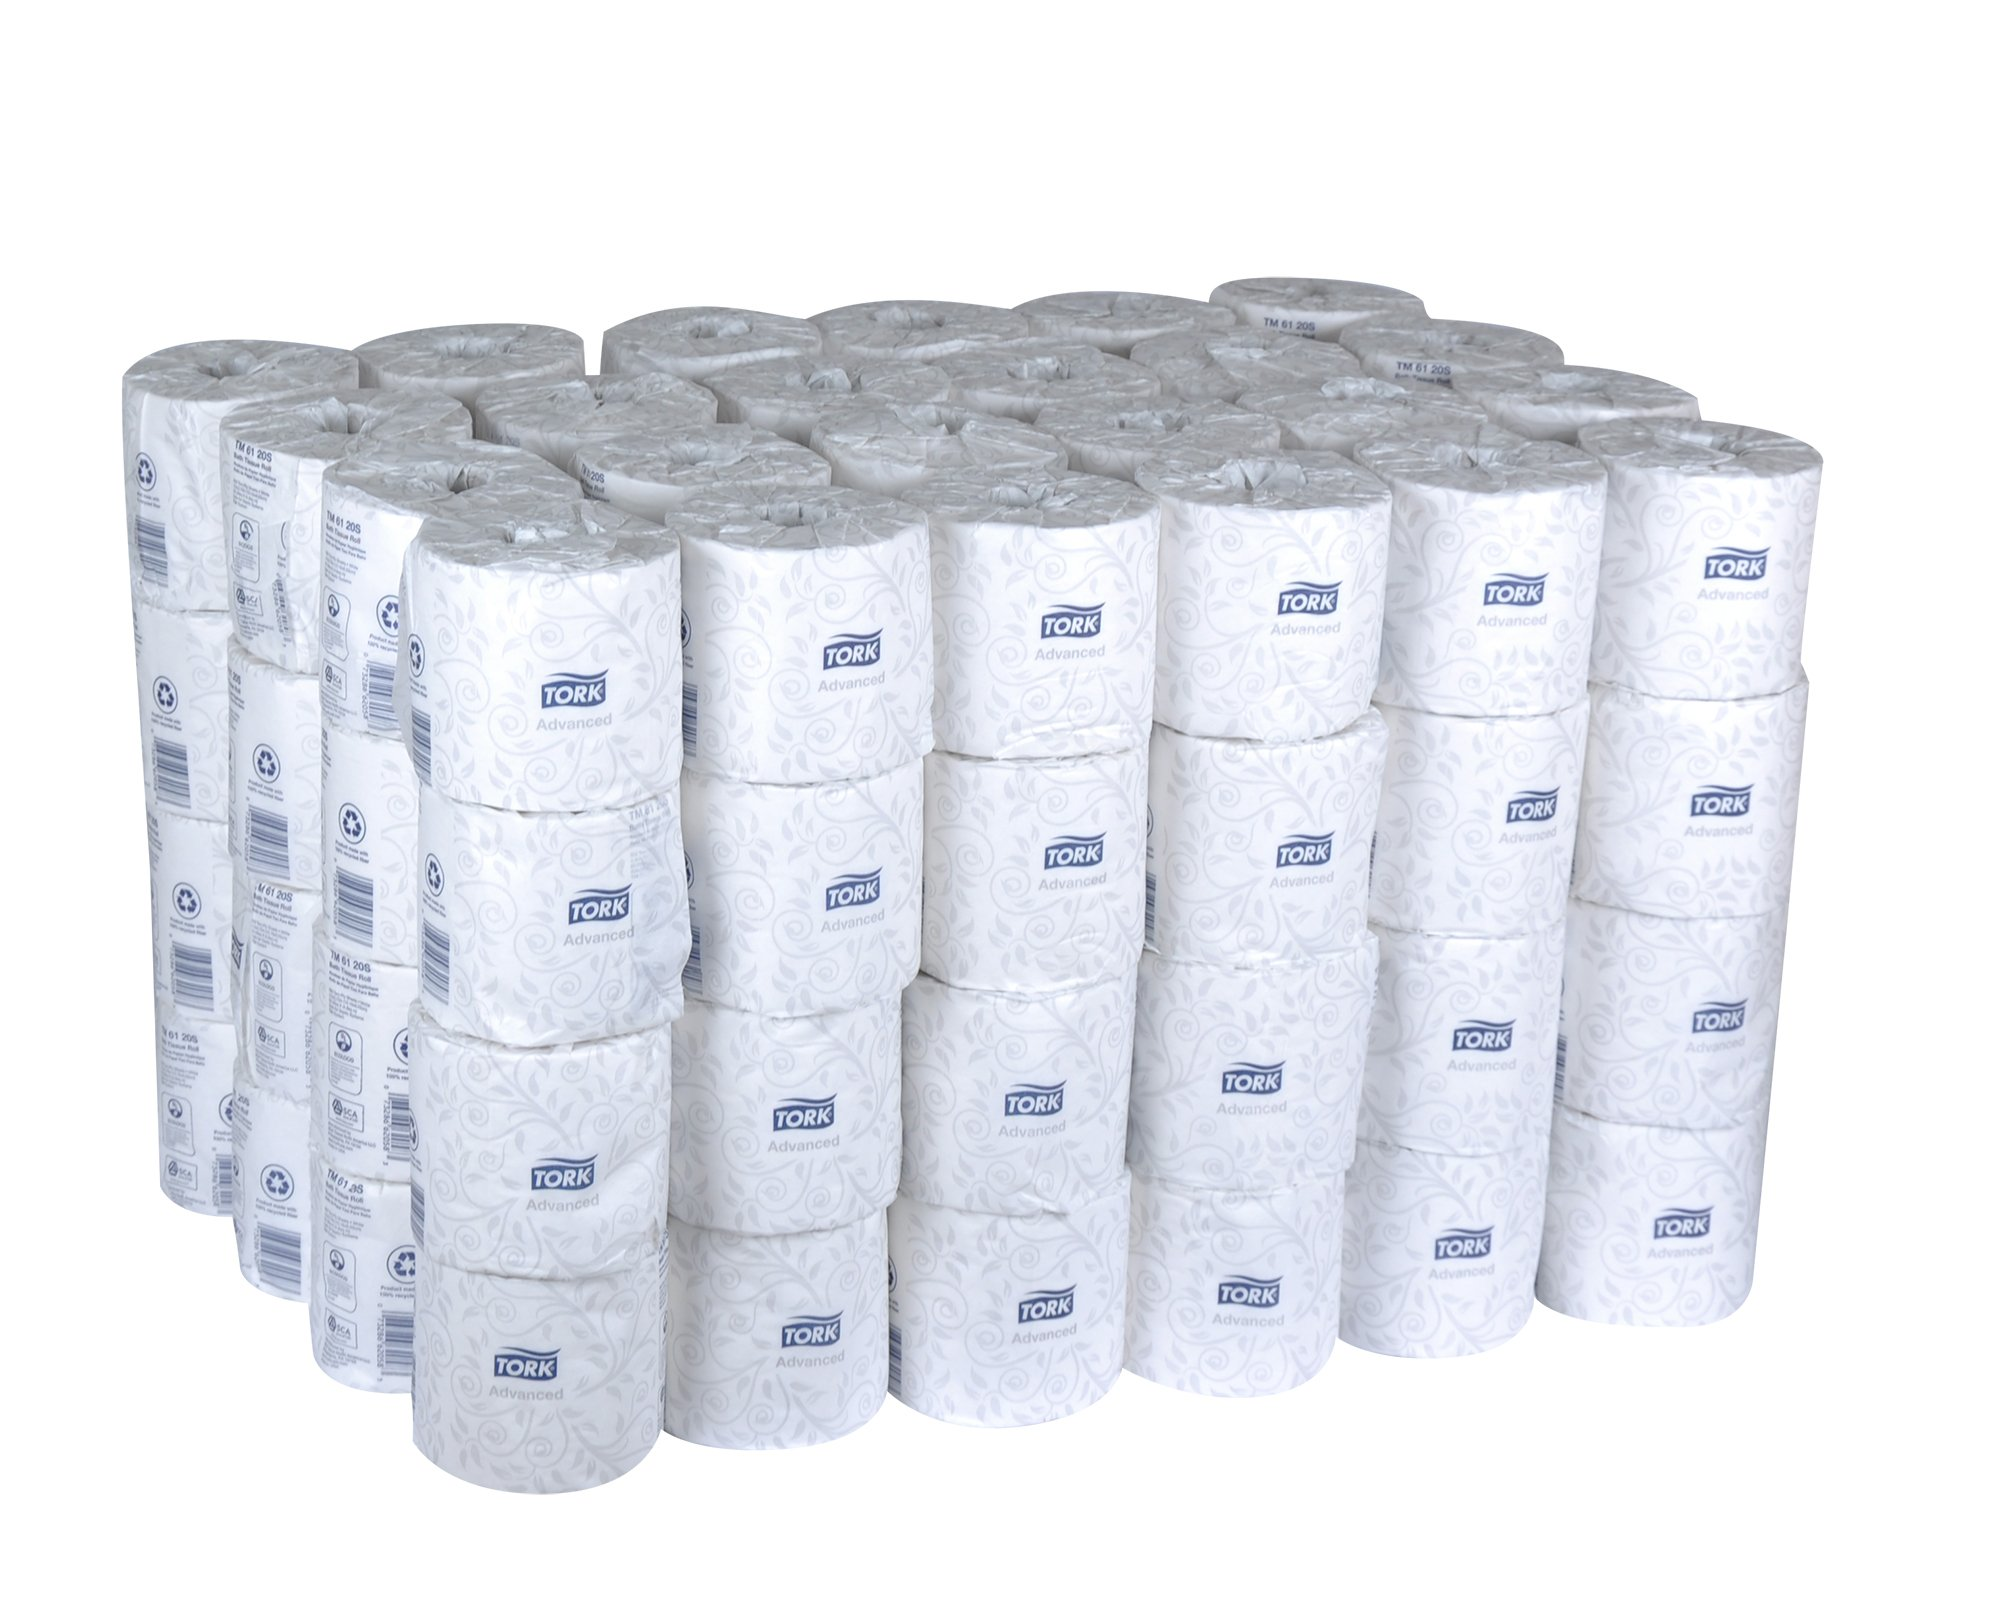 Tork Advanced TM6120S Bath Tissue - 96 rolls